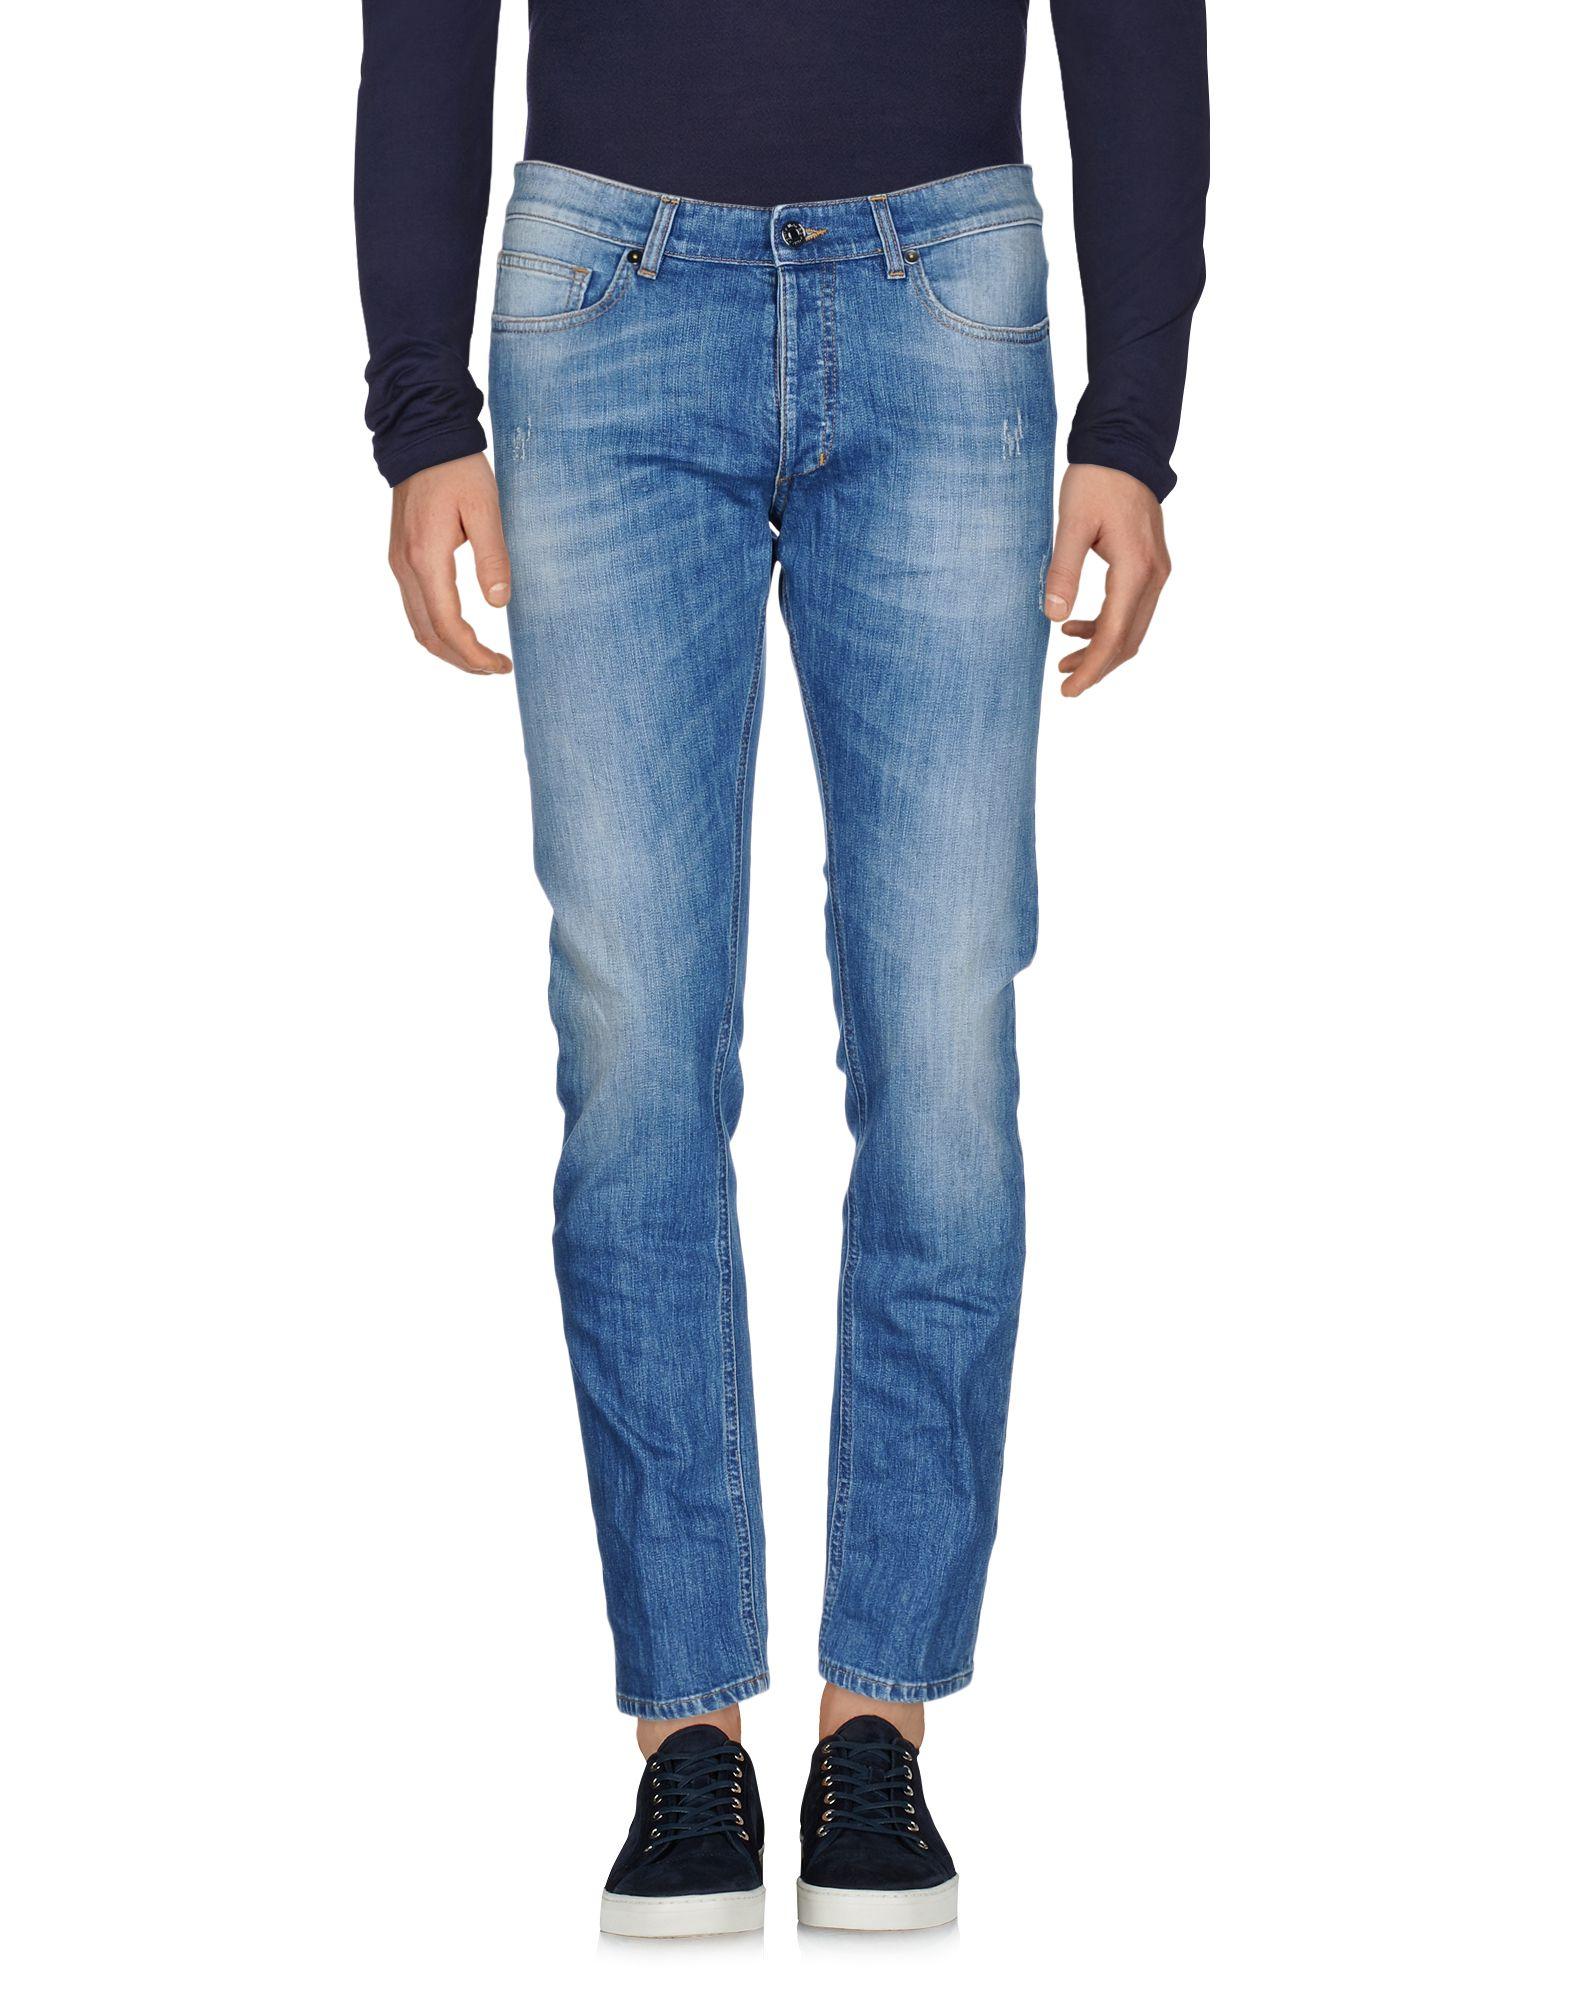 MAURO GRIFONI Herren Jeanshose Farbe Blau Größe 7